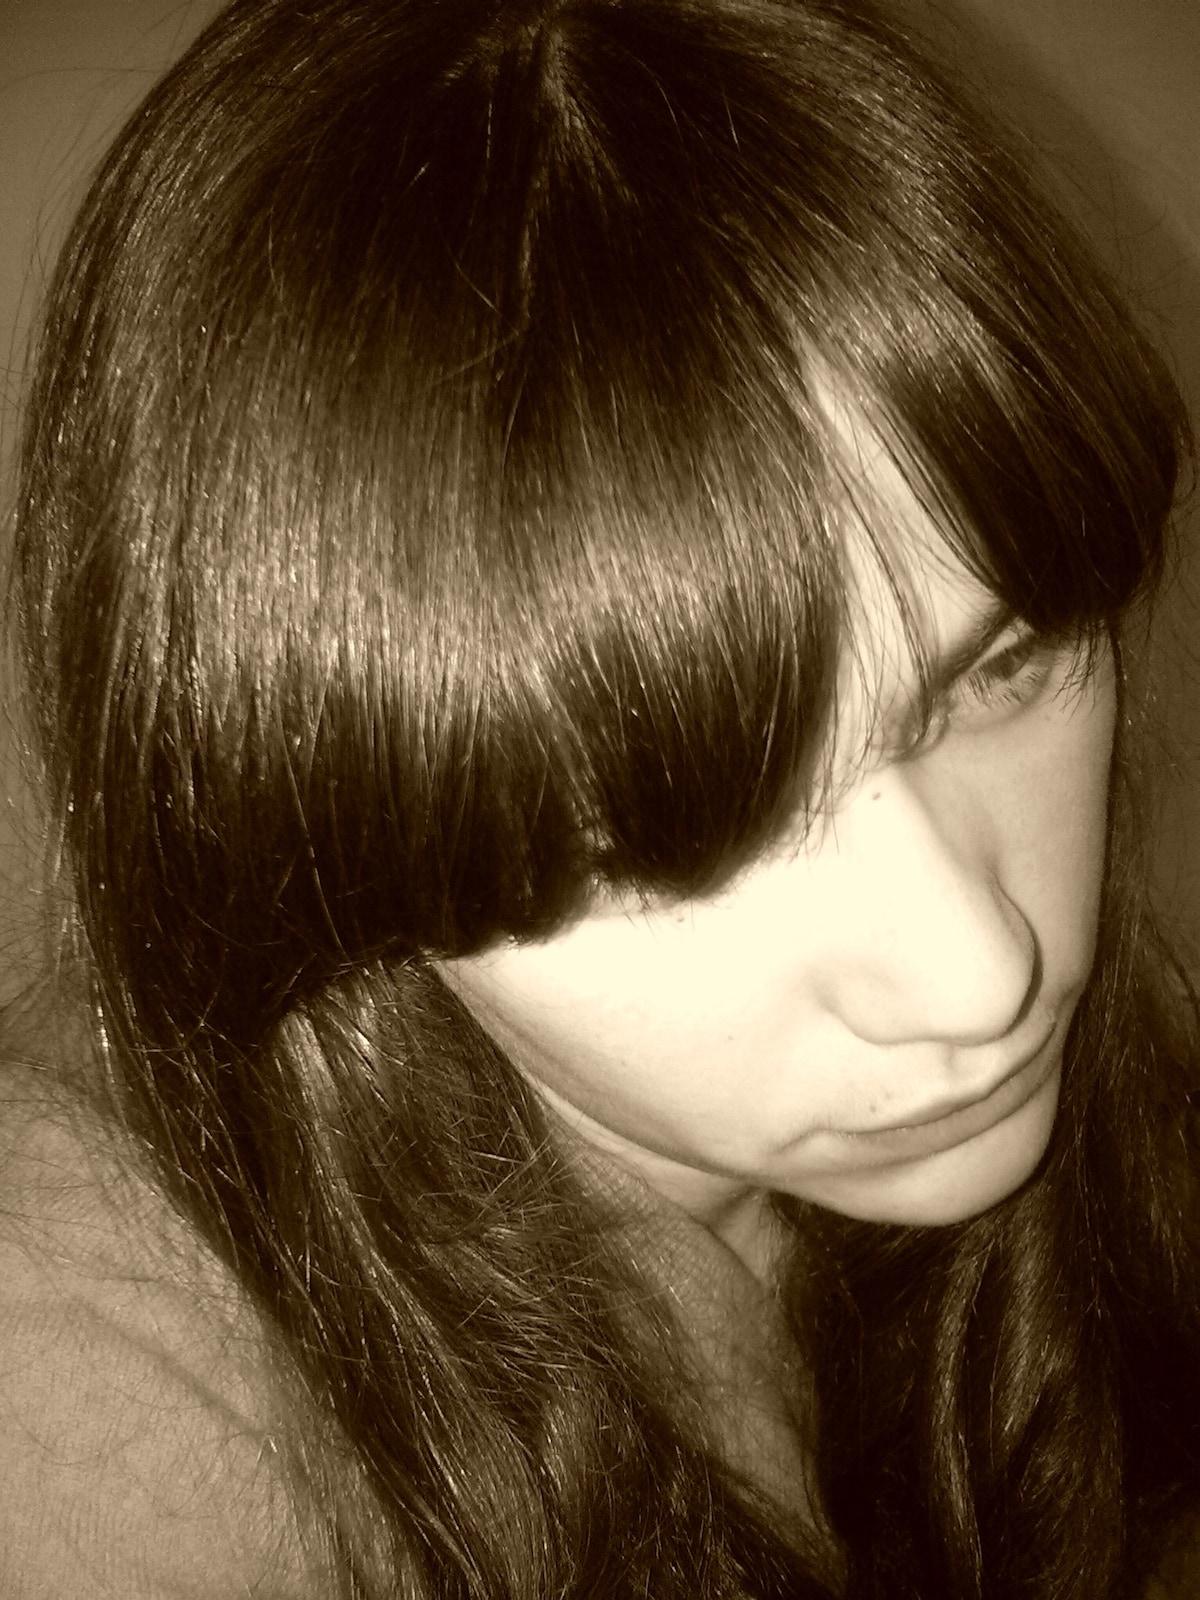 Nina from Oberolang